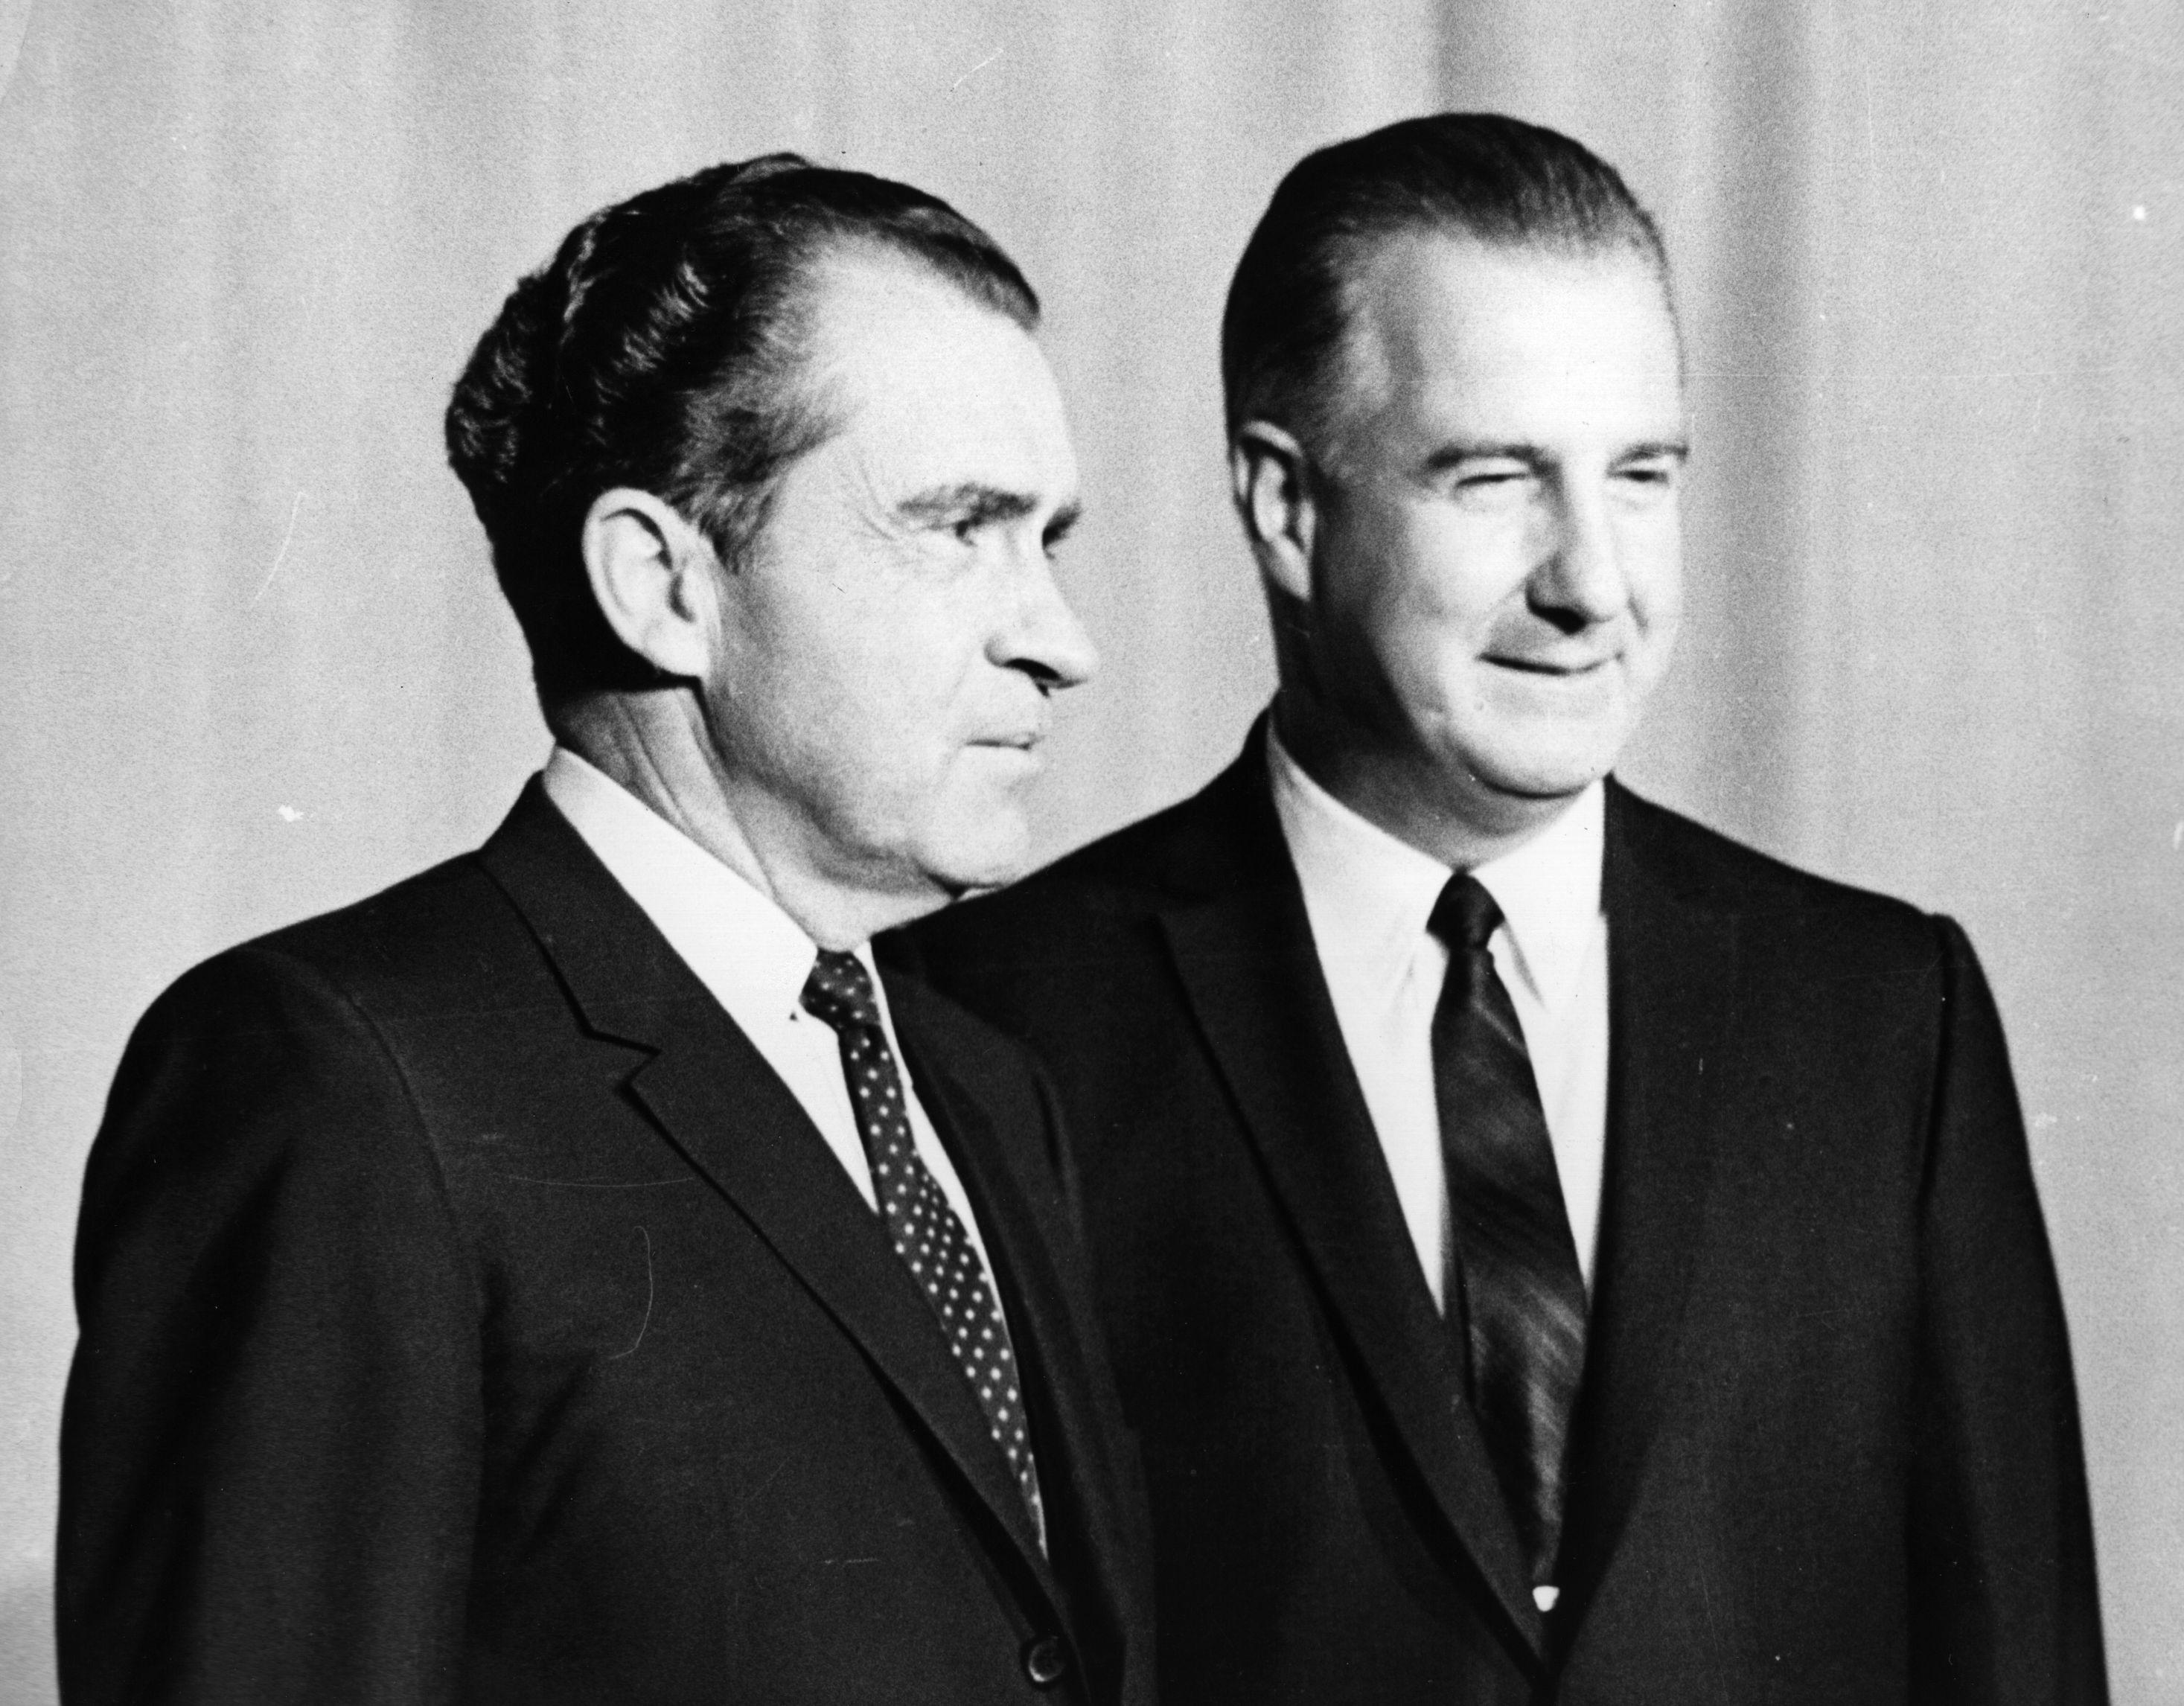 Richard Nixon and Spiro Agnew